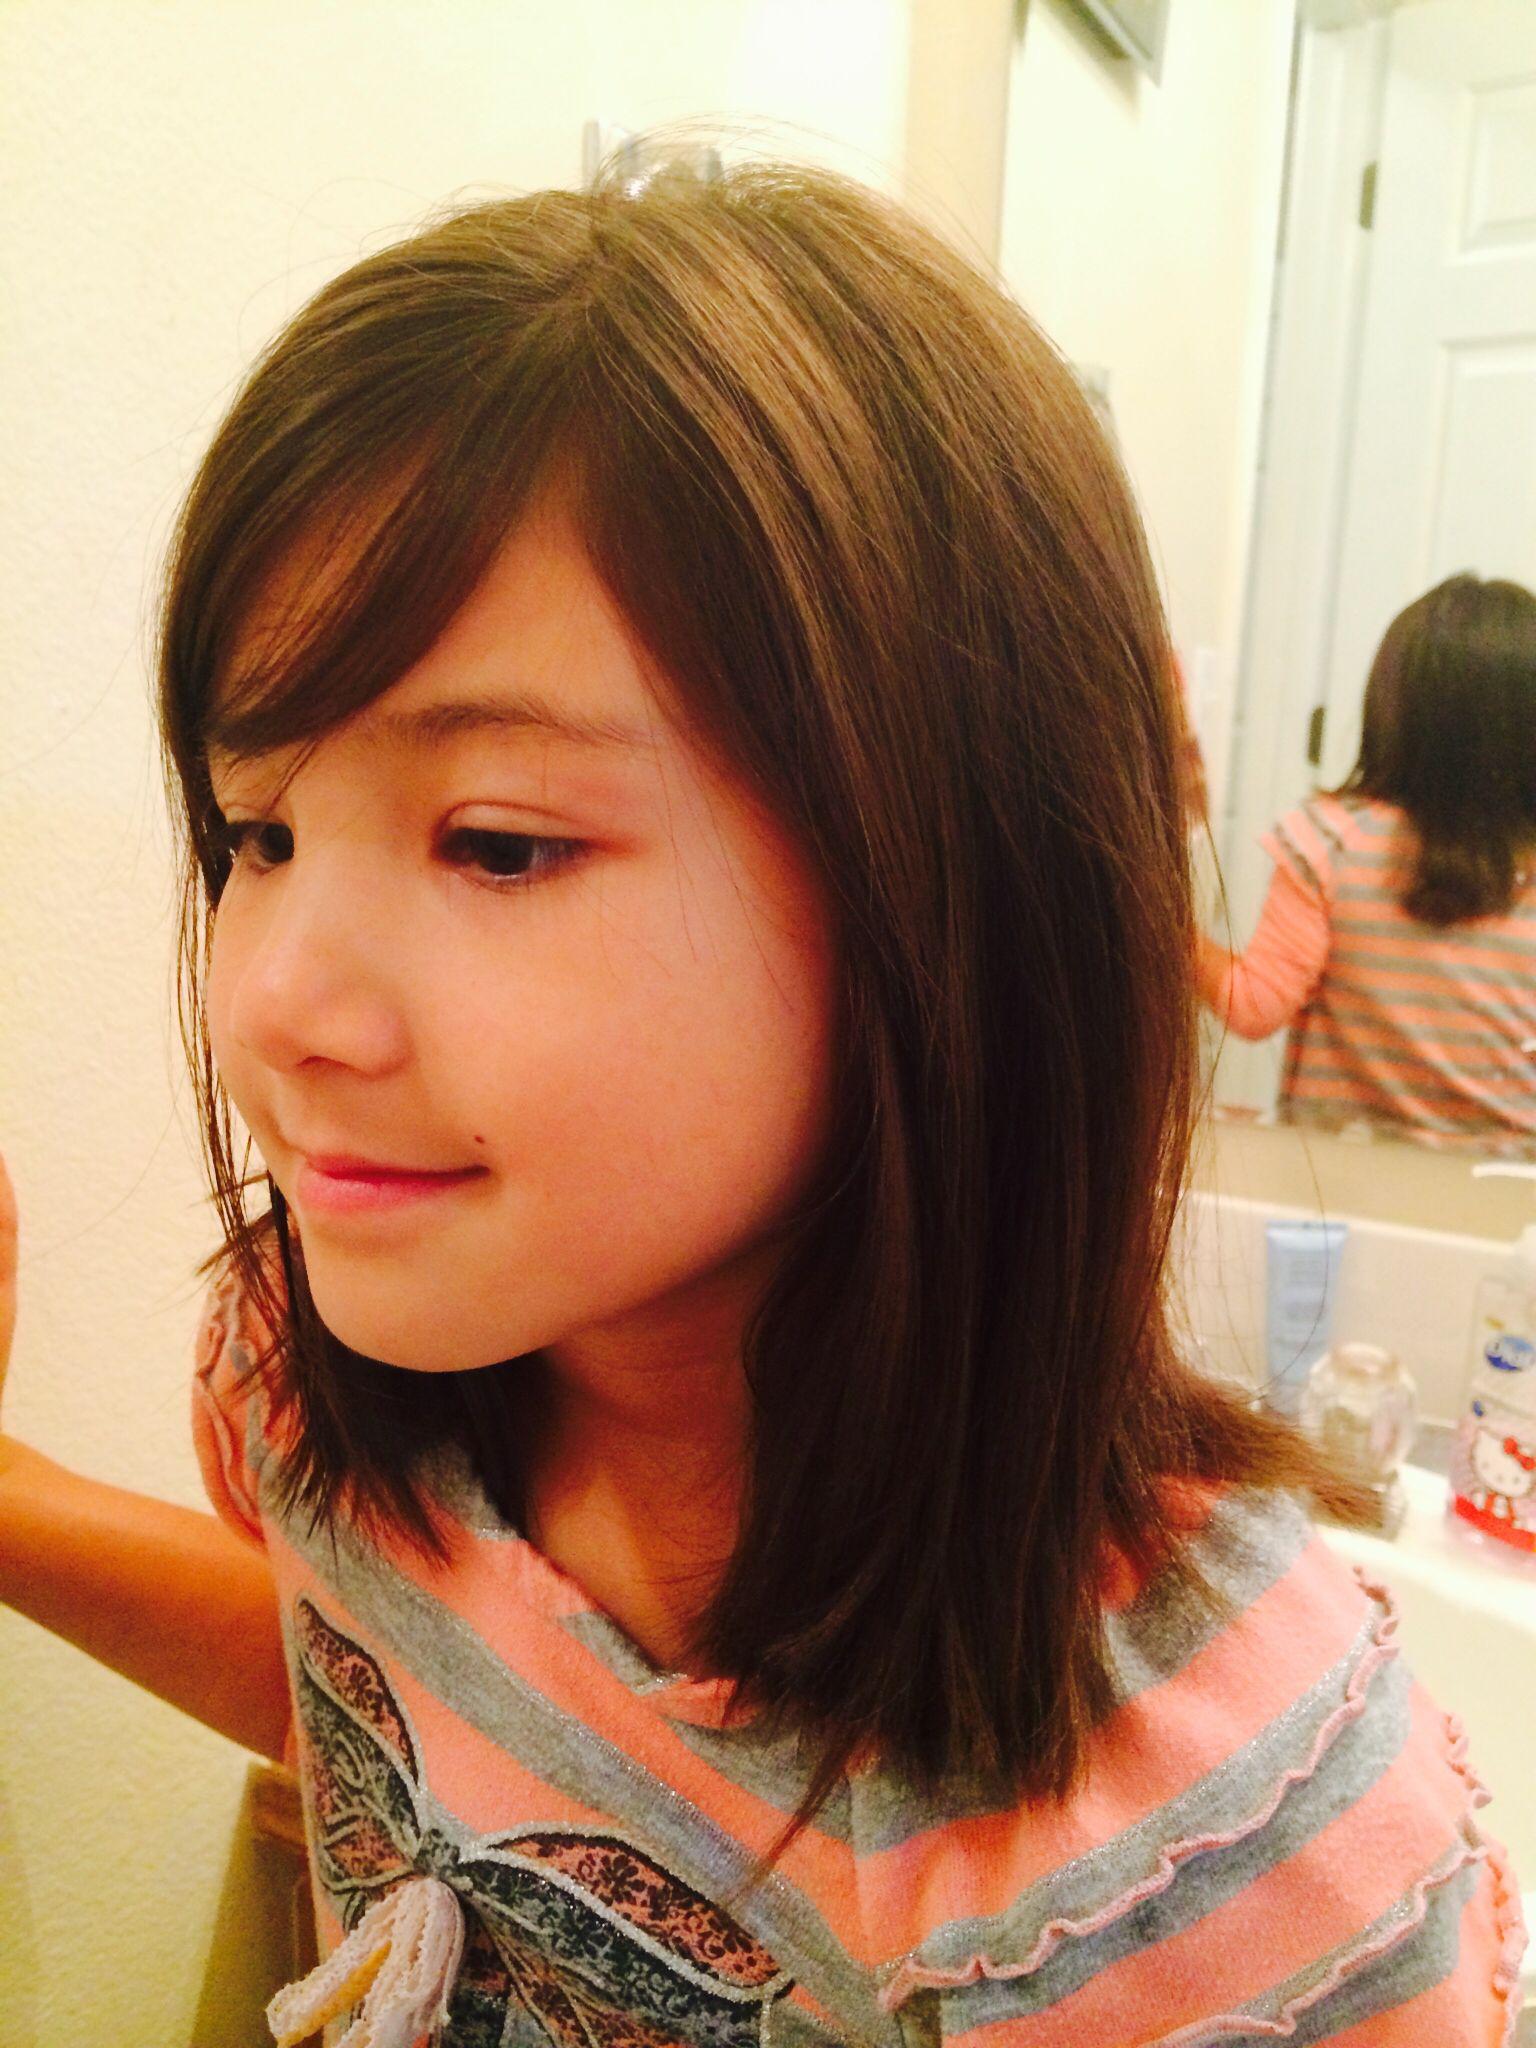 Medium length Little girl hair cut Hair Cuts Pinterest